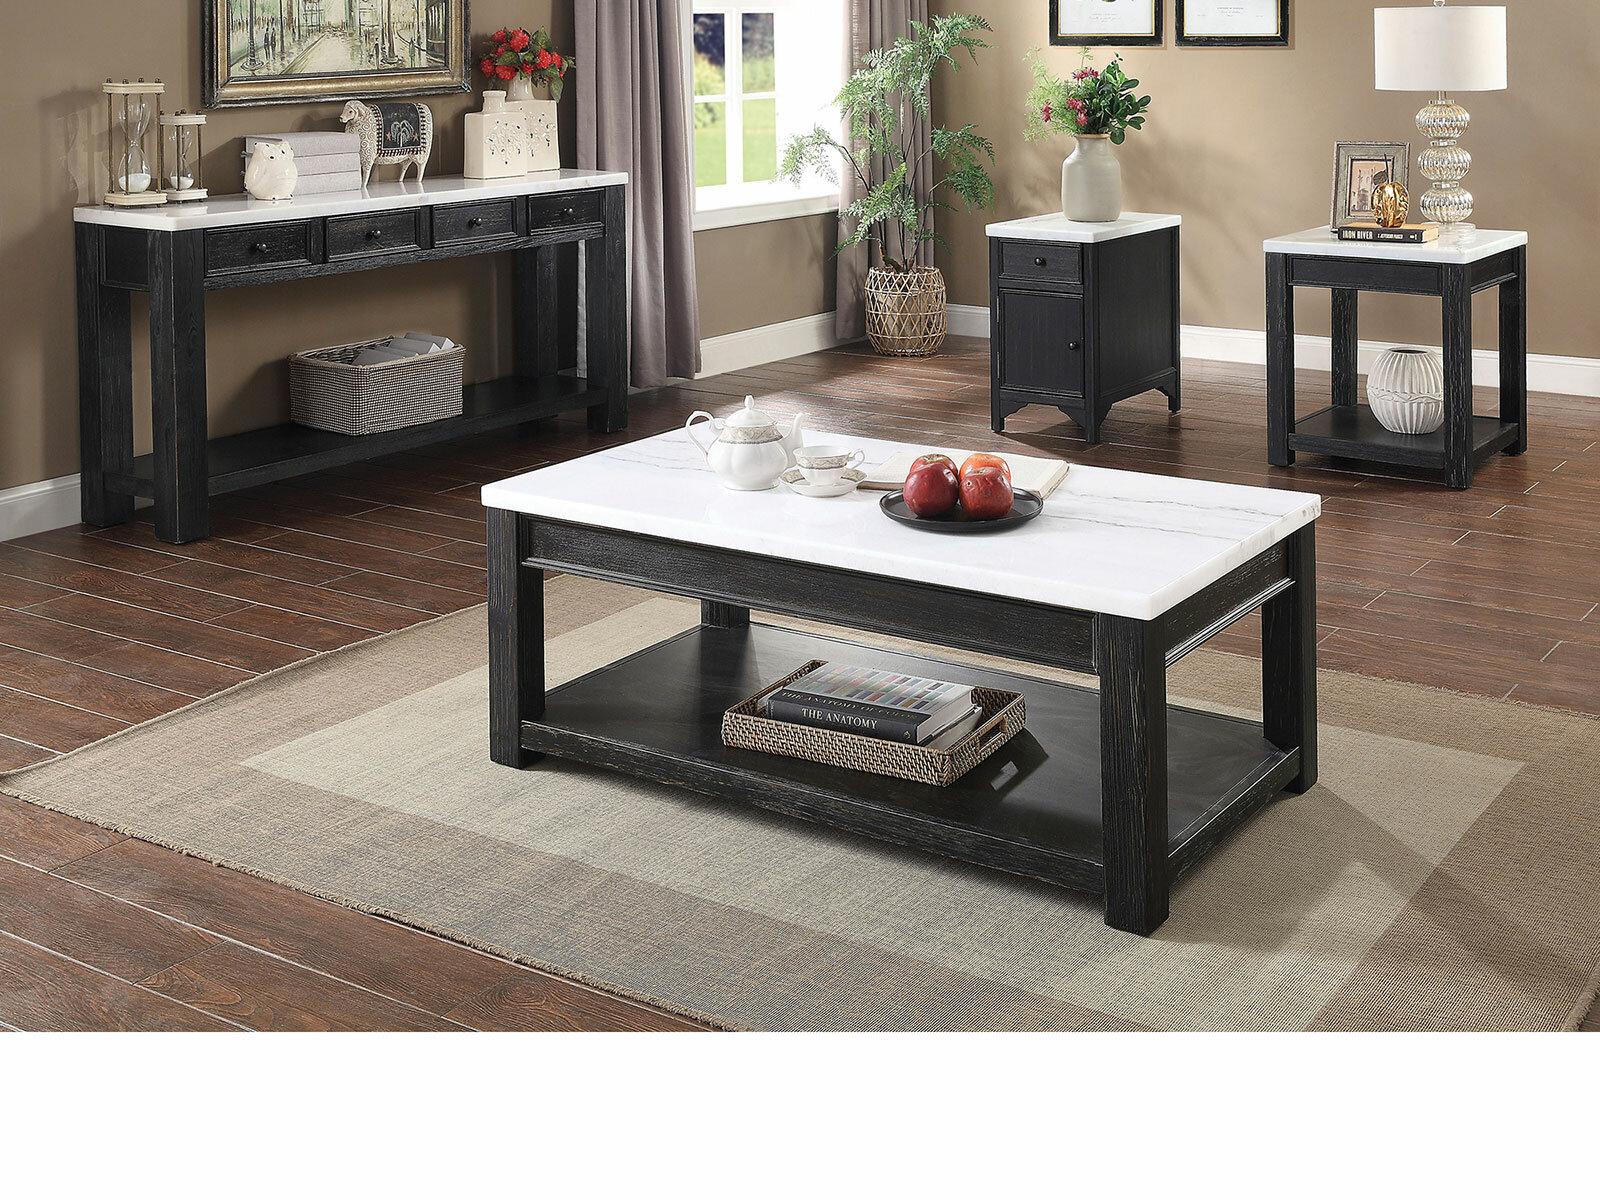 Gracie Oaks Axbridge 4 Piece Coffee Table Set Reviews